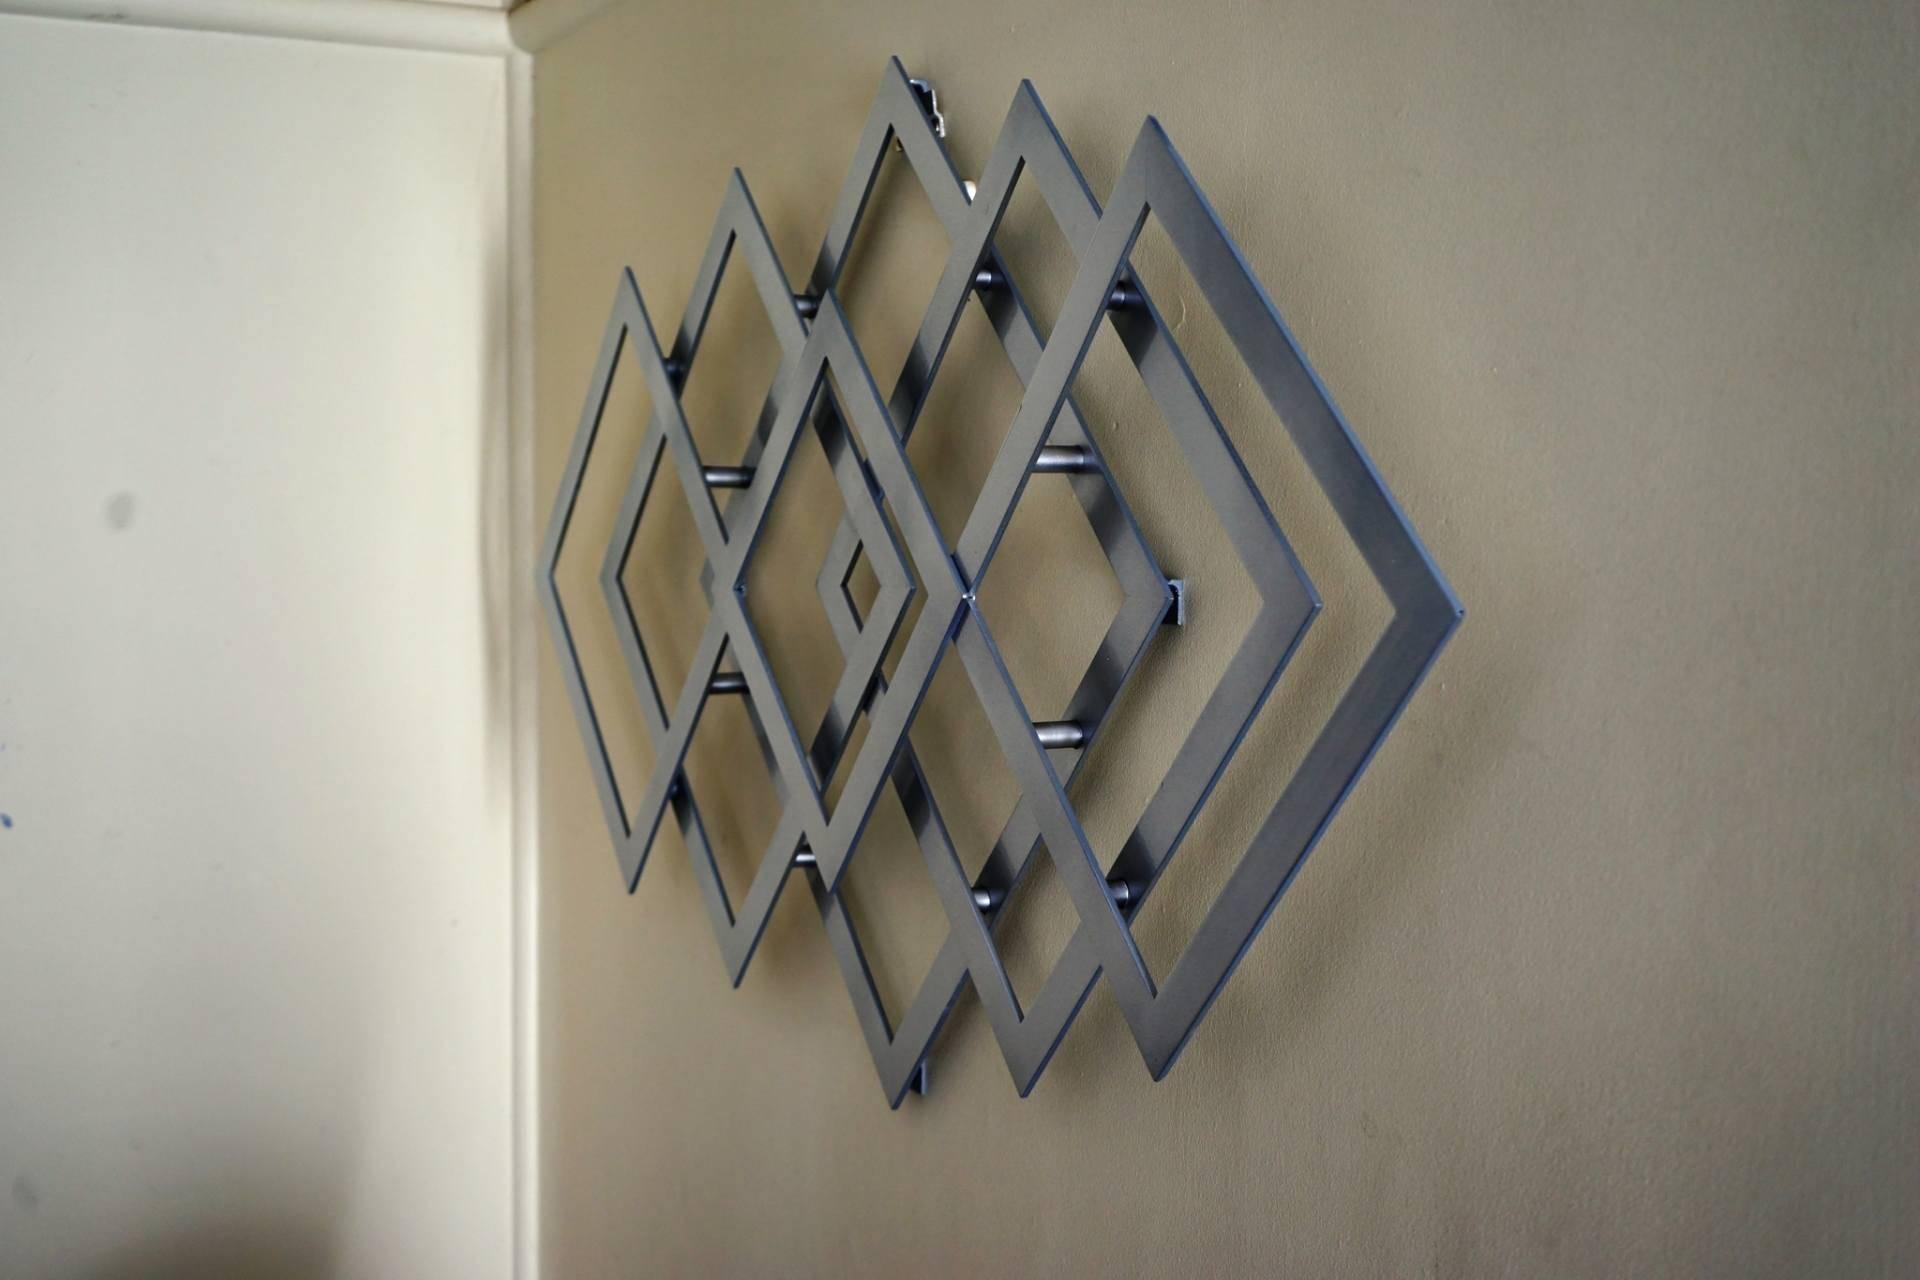 Saatchi Art: Geometric Metal Wall Art Sculpturealdo Milin In Latest Geometric Metal Wall Art (View 3 of 20)